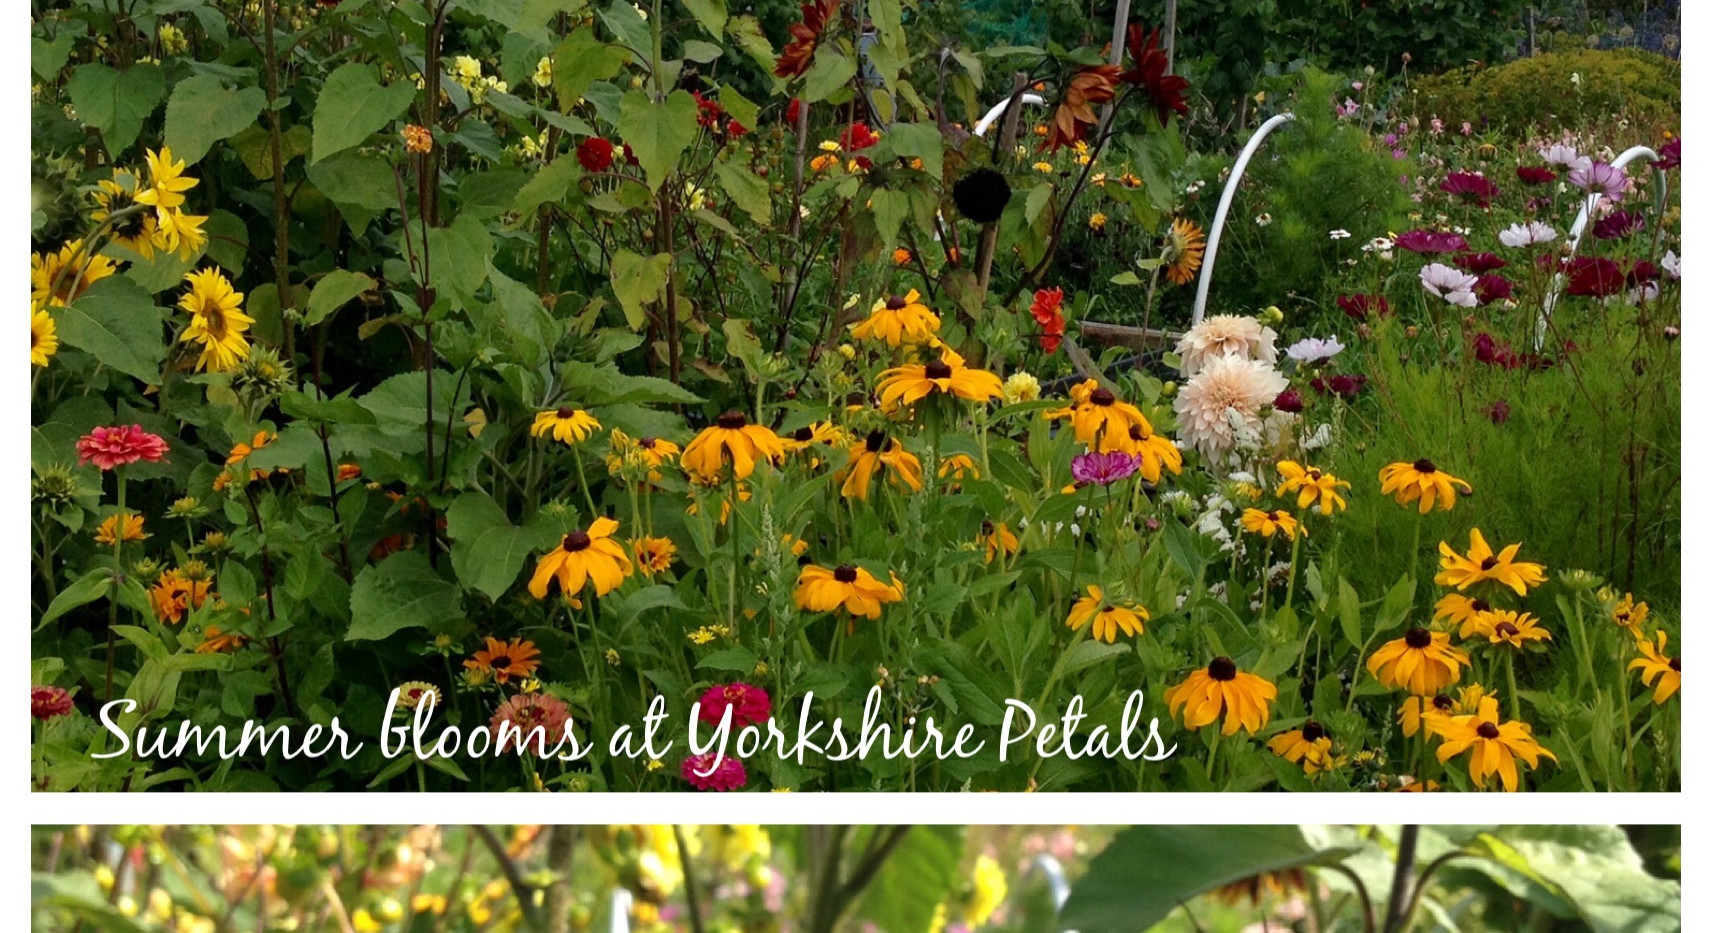 Summer Flowers at Yorkshire Petals